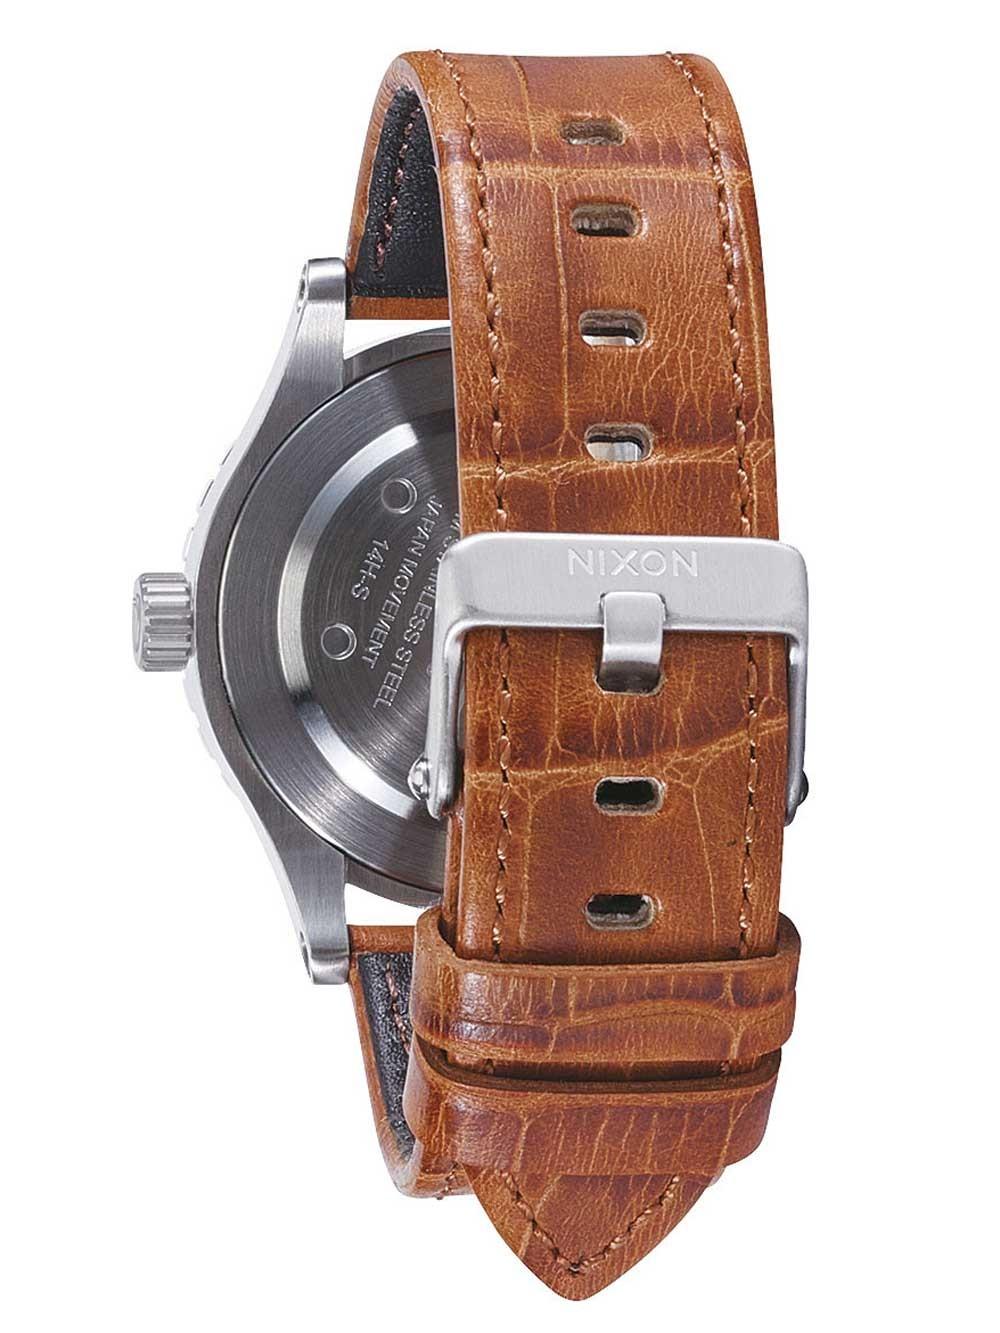 UhrenChrono12 Gator 38 1888 A467 Nixon 20 Saddle 20atm Leather 38mm rdtosQxBhC